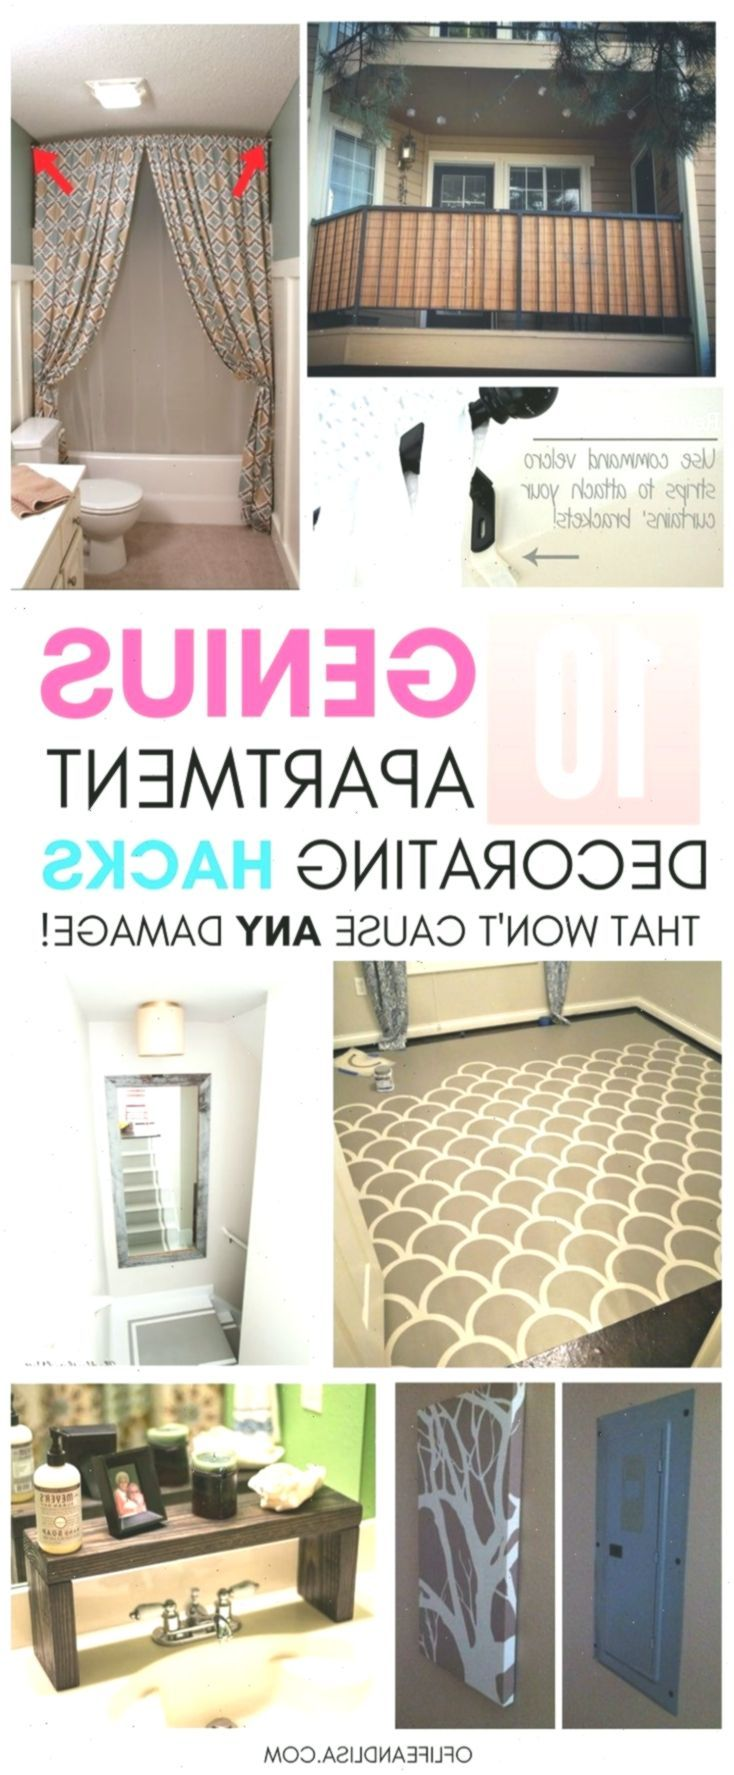 10 Incredibly Genius Apartment Decorating Hacks for ...